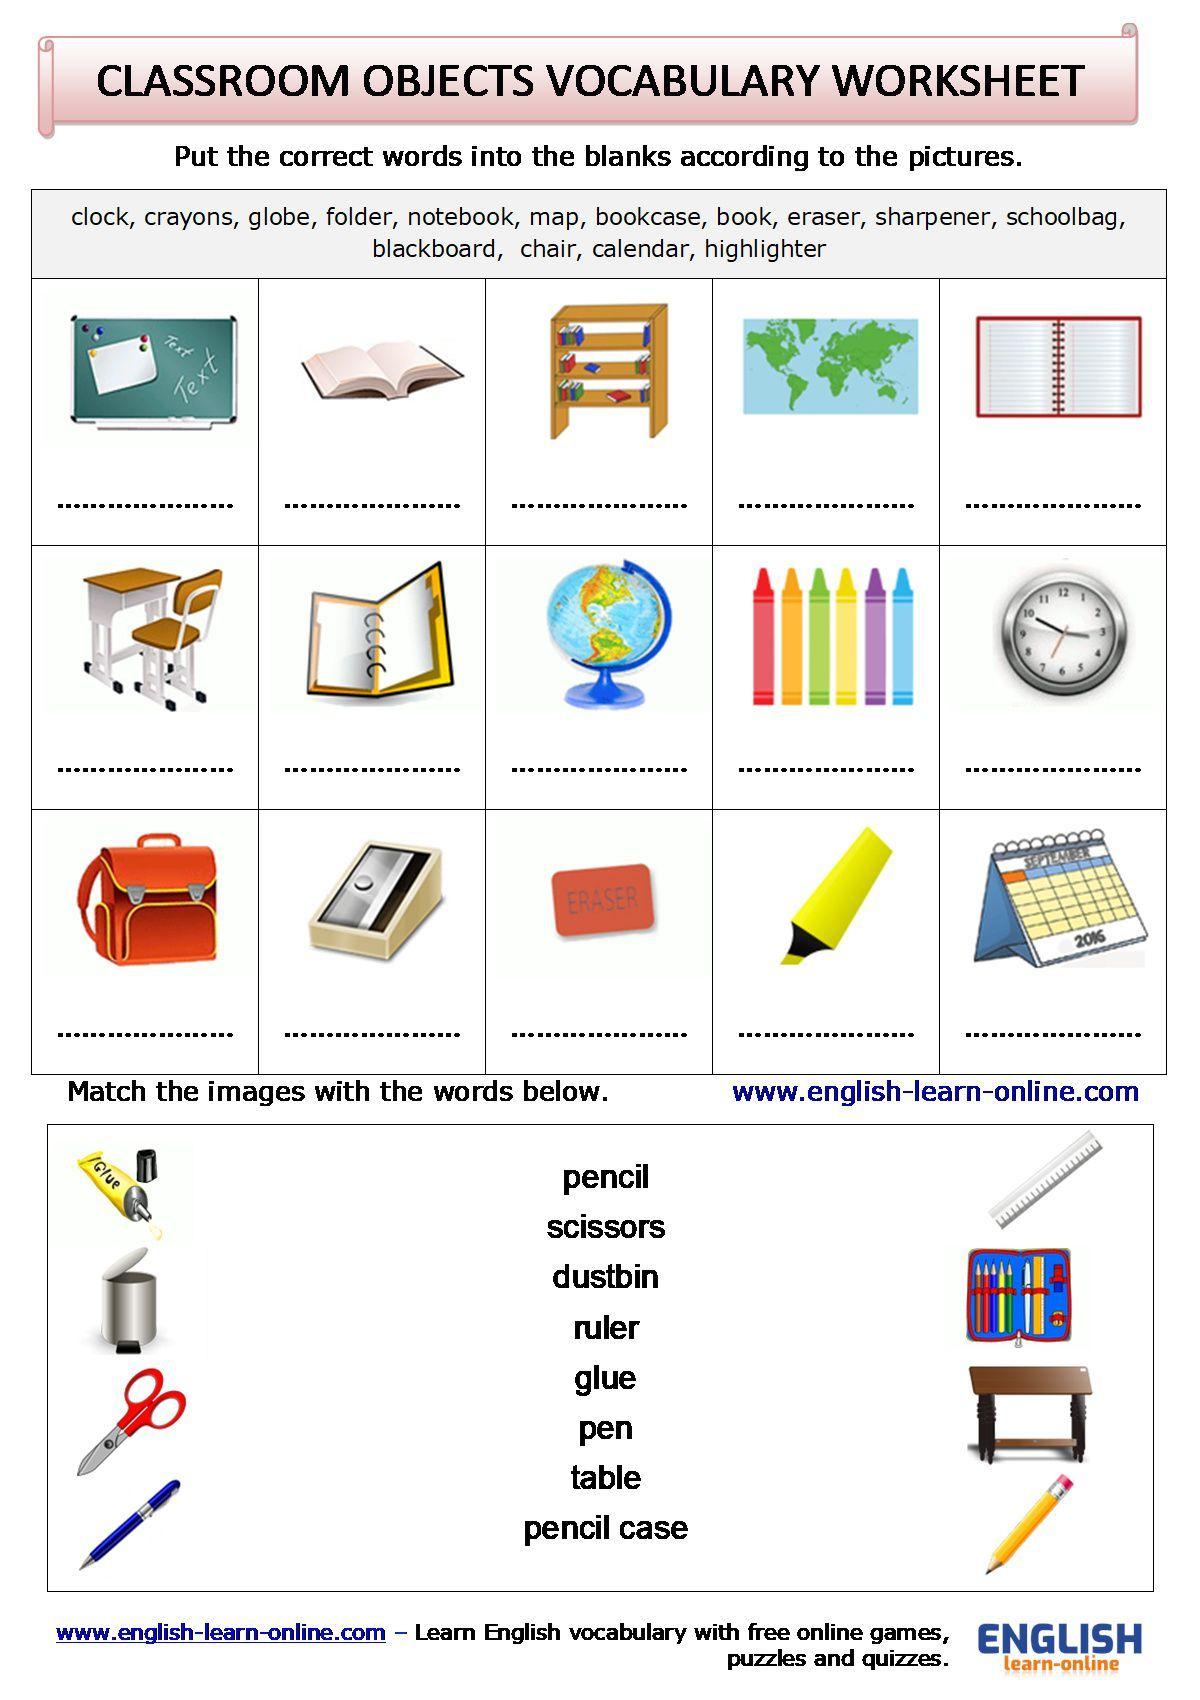 Printable Italian Grammar Exercises In 2021 English Vocabulary Classroom Vocabulary Activities [ 1700 x 1200 Pixel ]